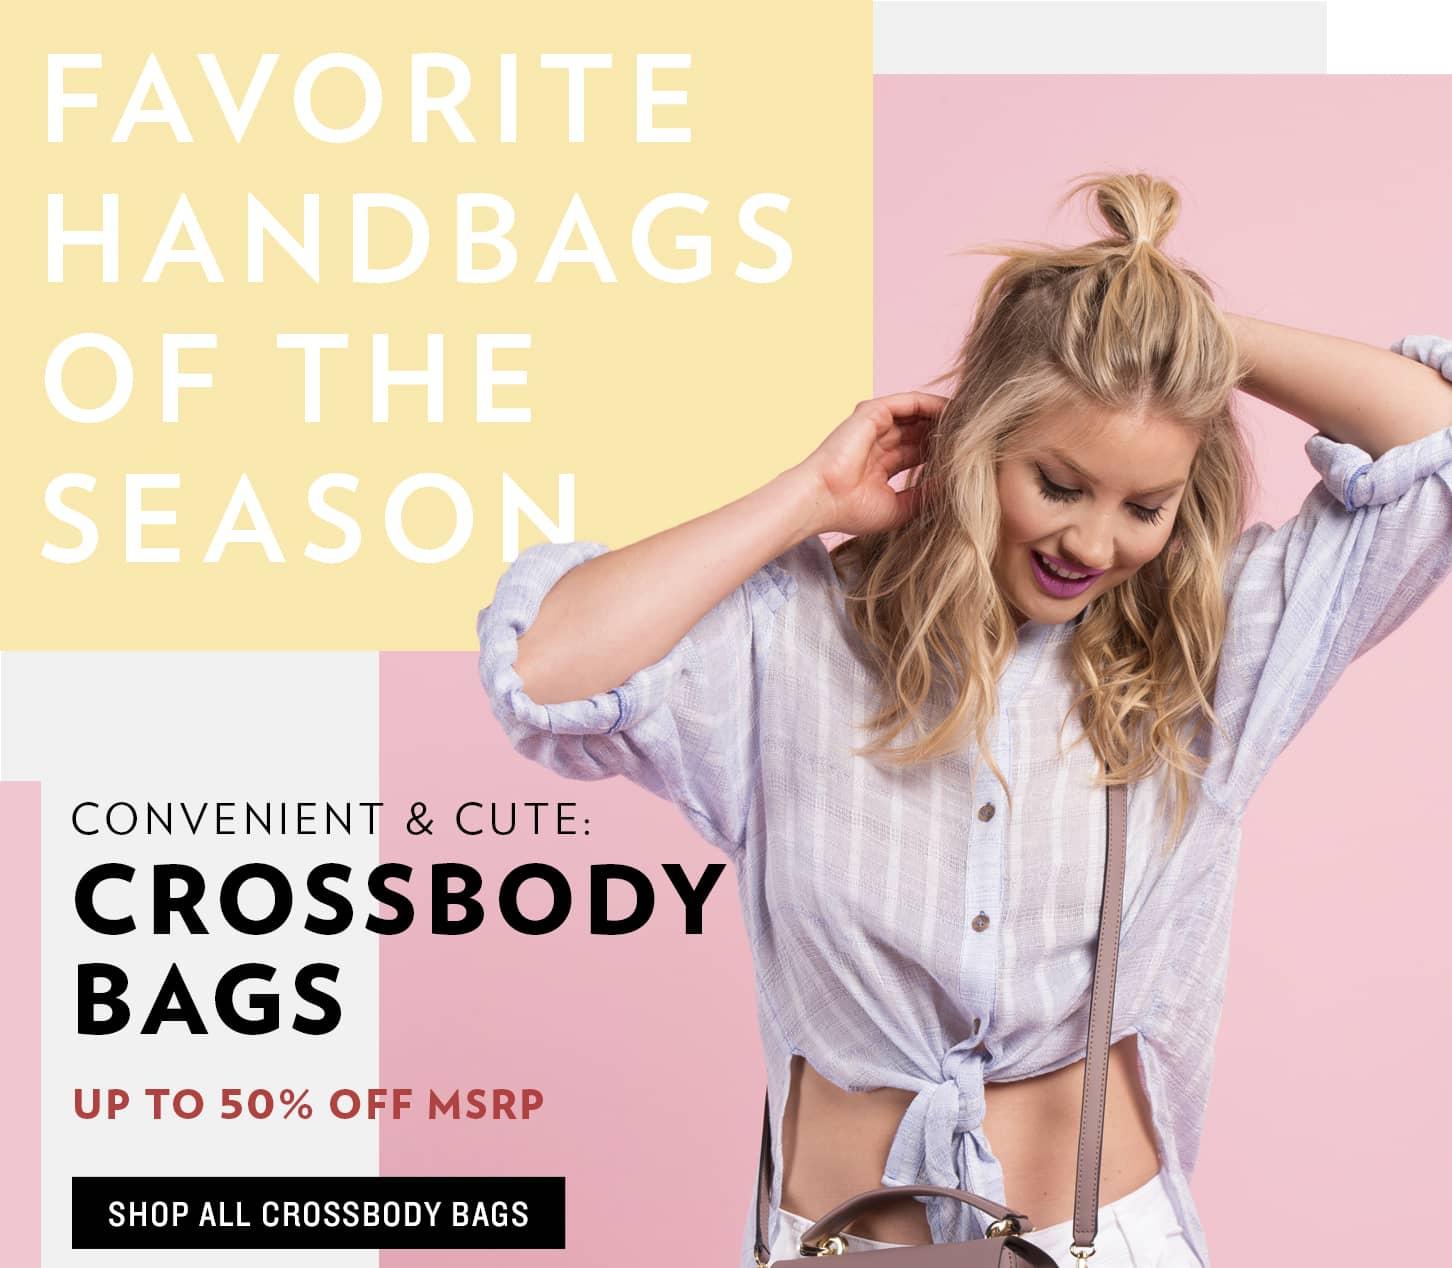 Shop All Crossbody Bags